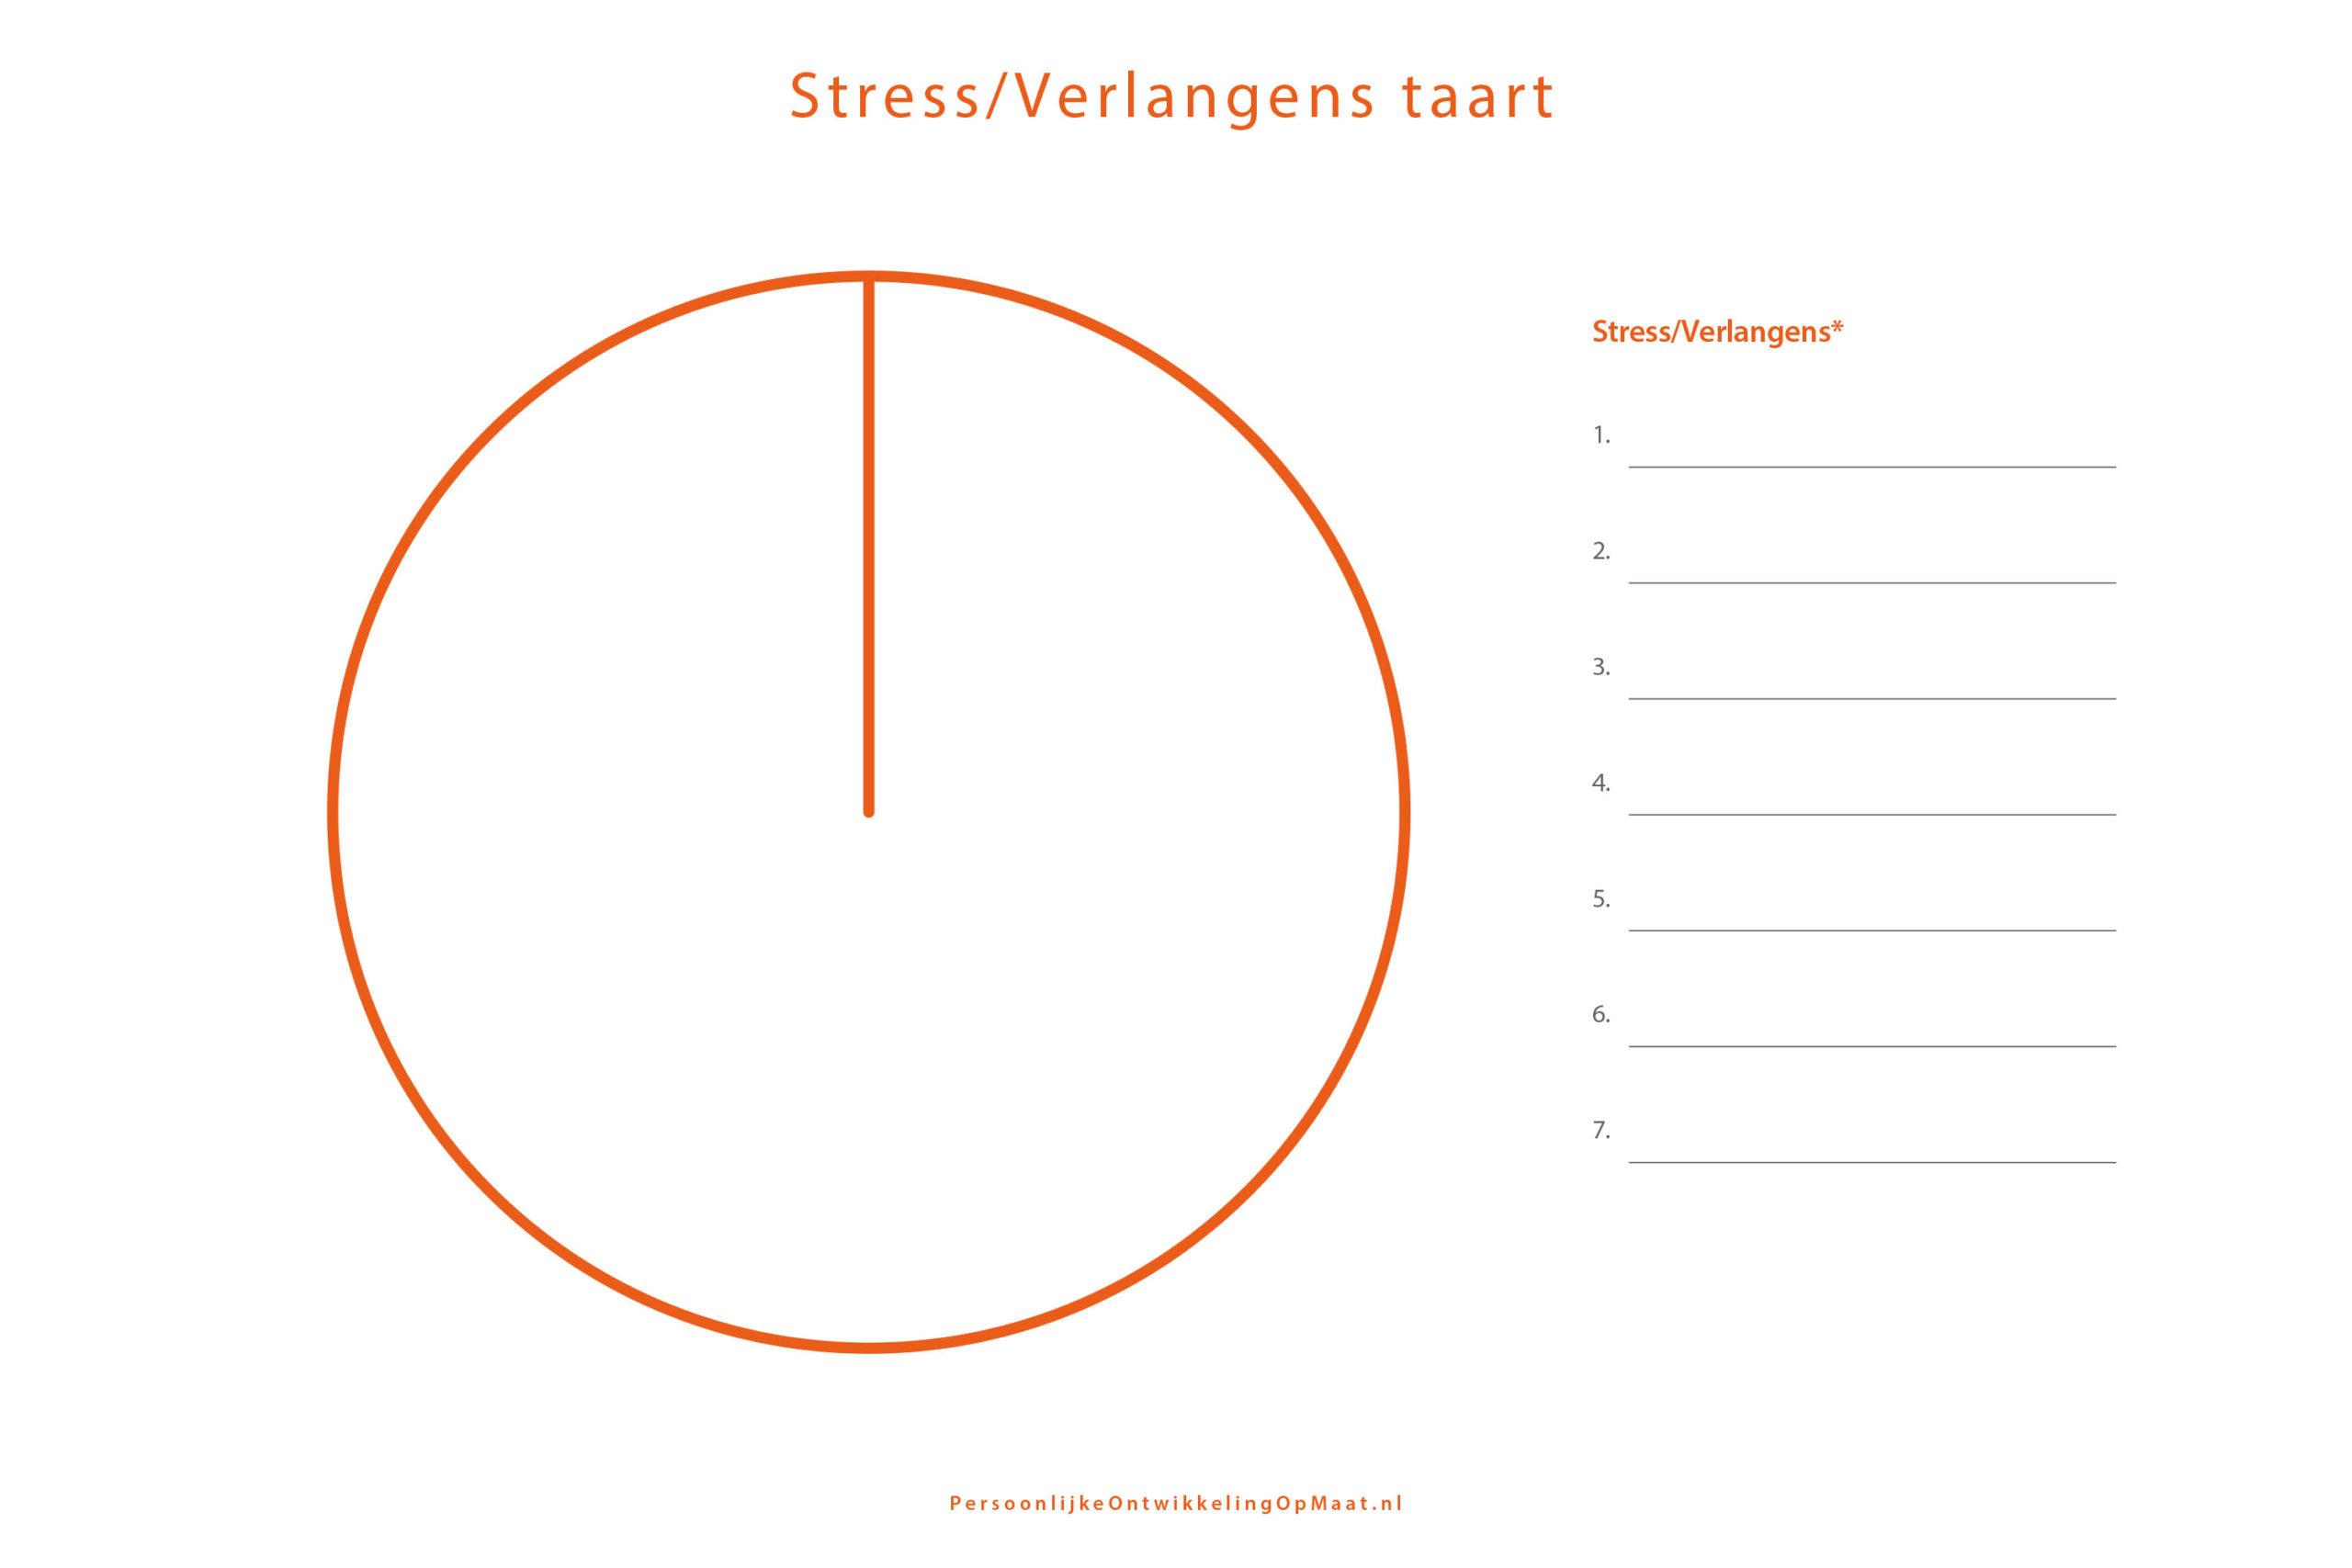 Stress desires pie template